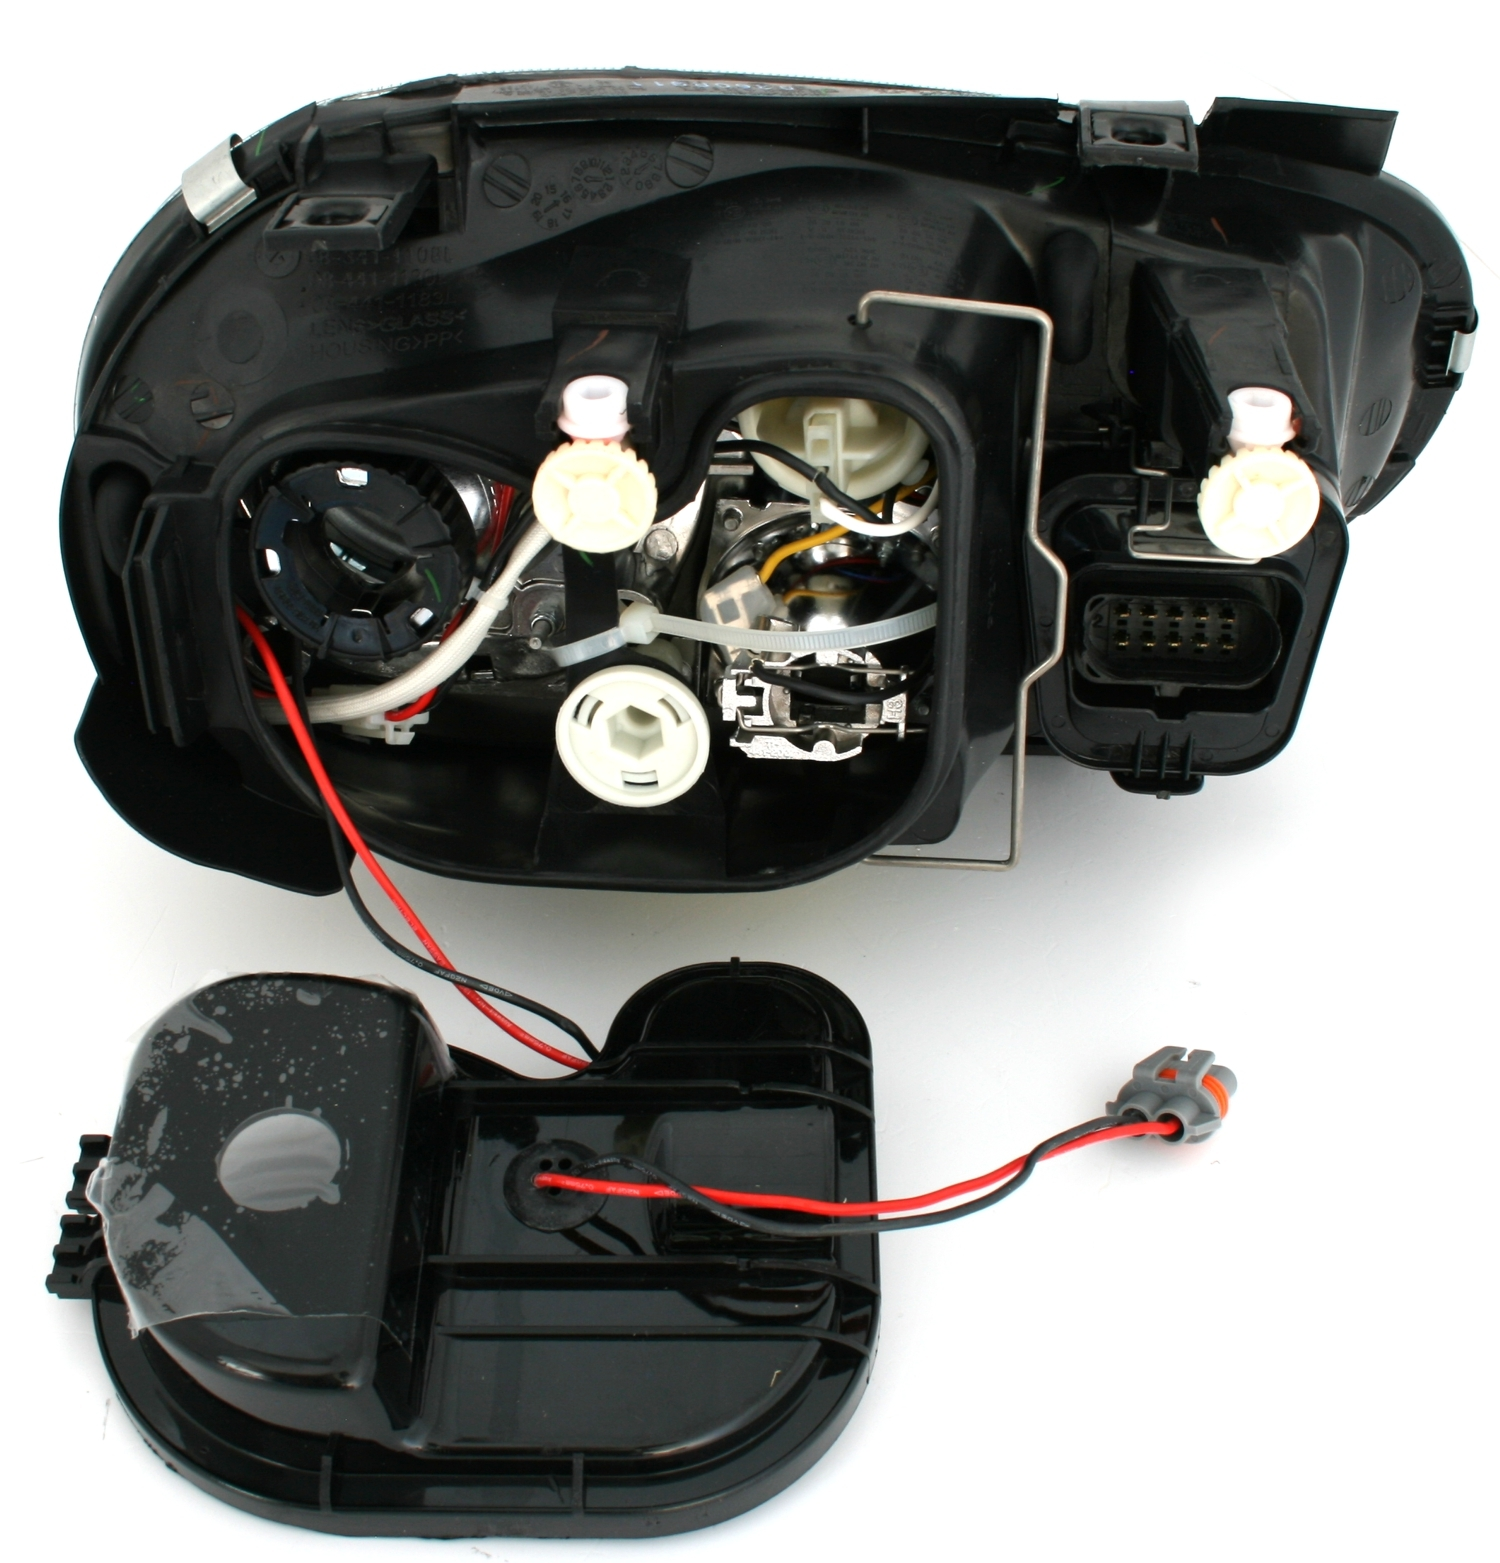 vw golf 4 xenon scheinwerfer set schwarz d2s links. Black Bedroom Furniture Sets. Home Design Ideas